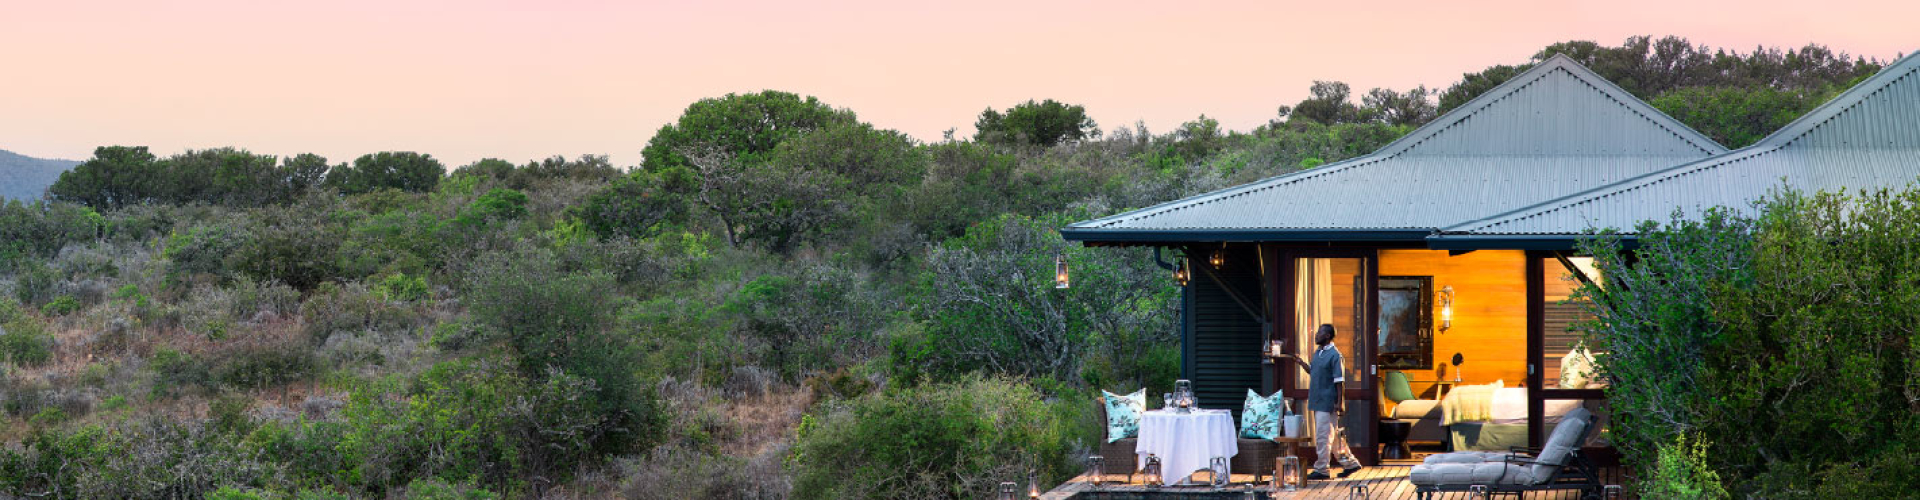 Kwandwe Game Reserve - Luxe Safari Zuid-Afrika - Header